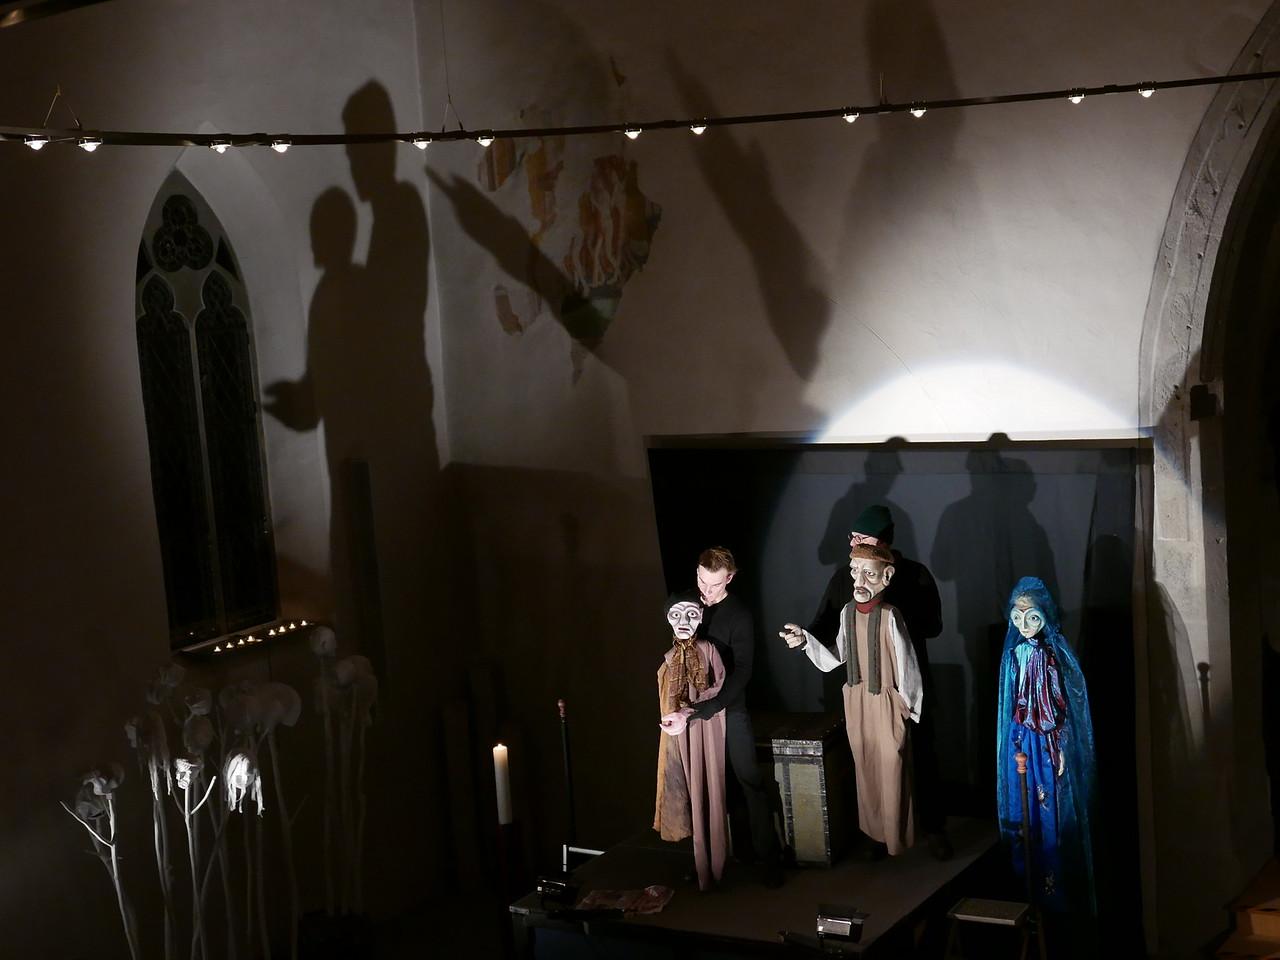 @ 28.03.18, 20:21 / kath. Kirche Veltheim-Winterthur